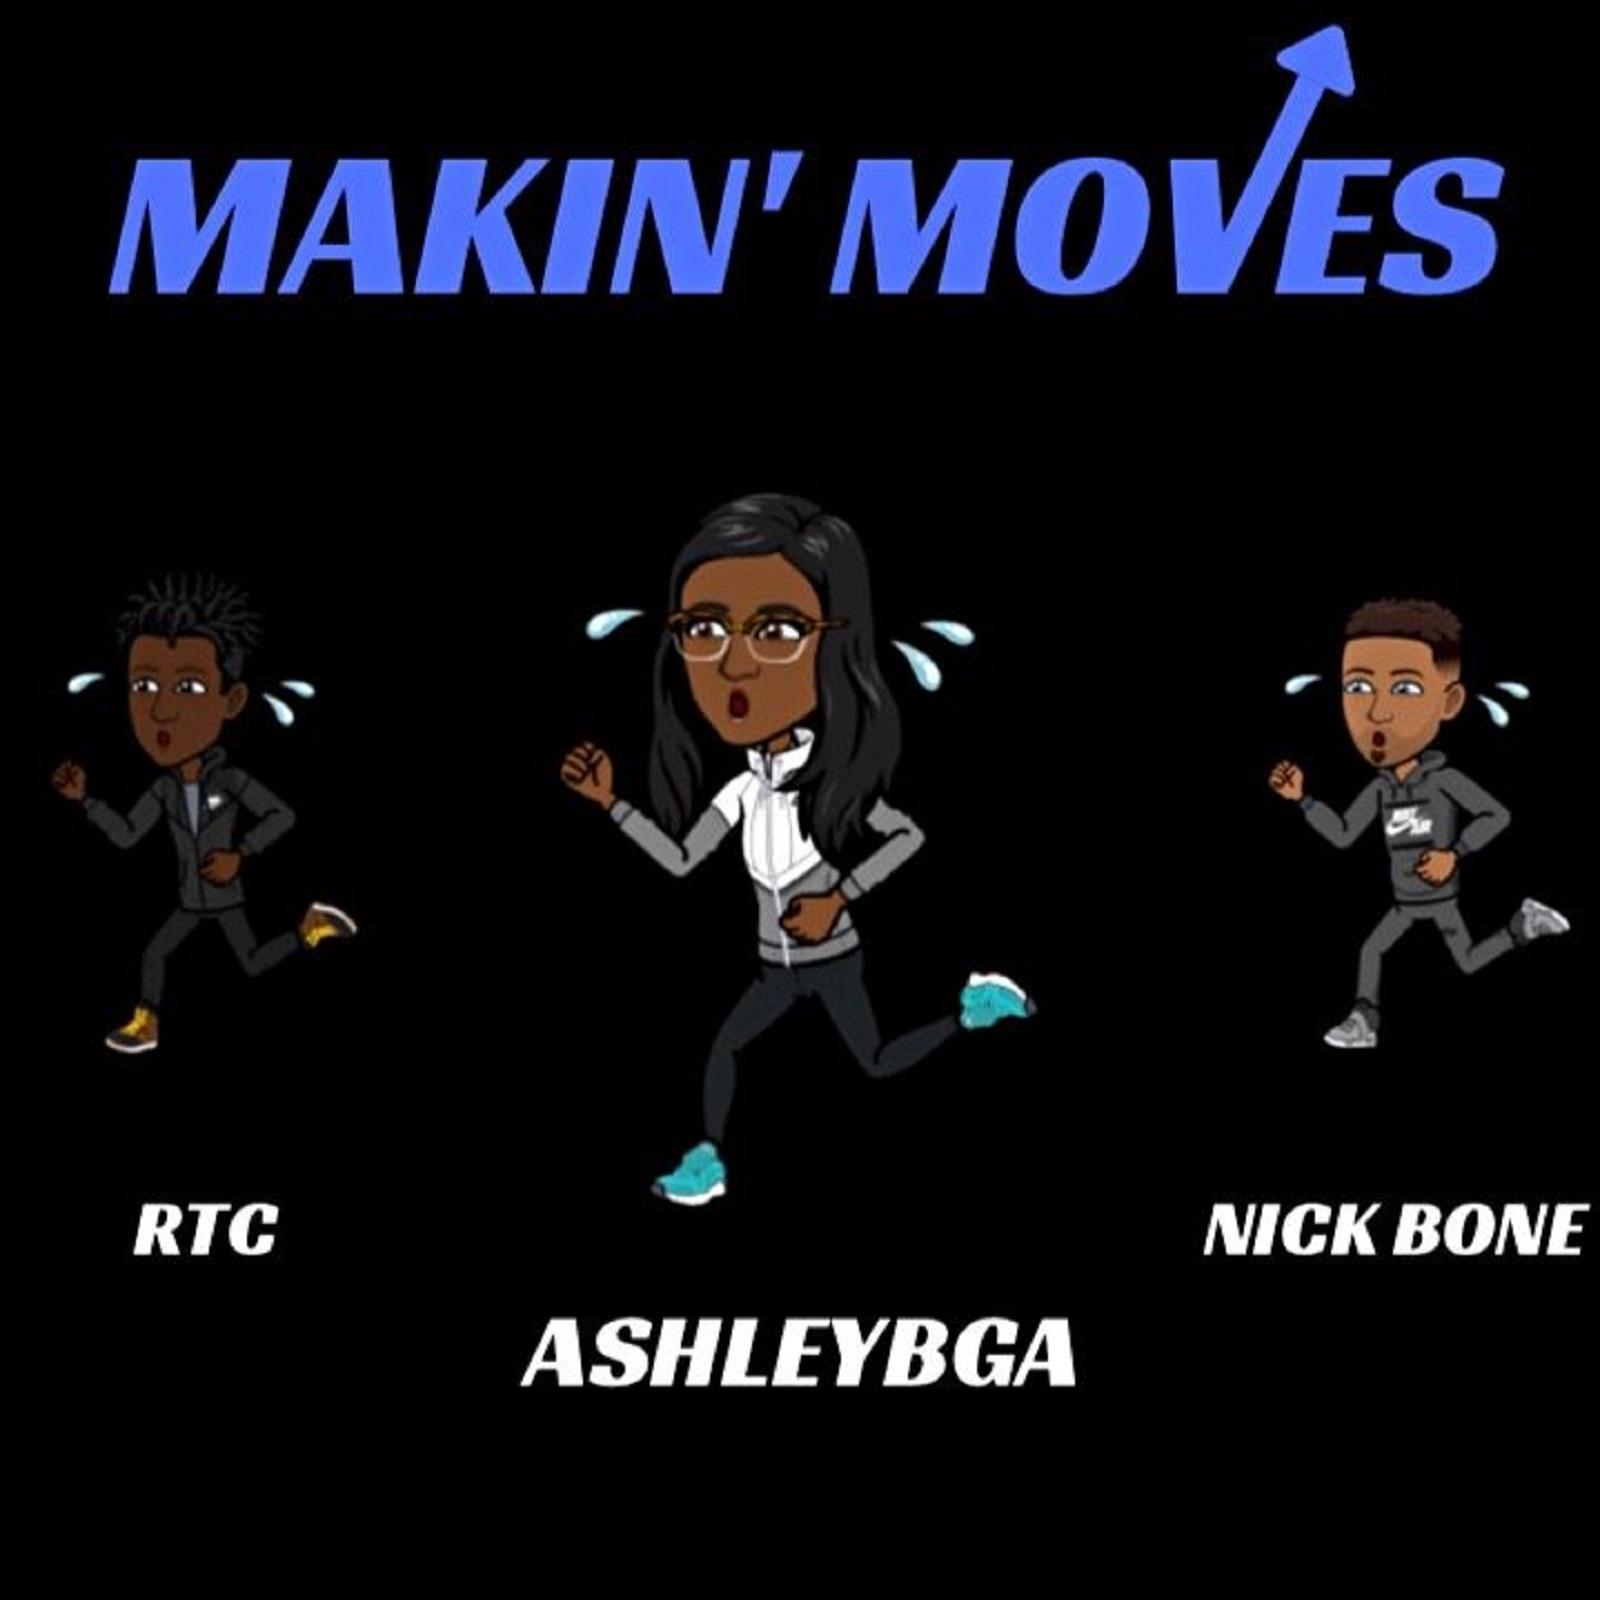 Makin' Moves by AshleyBGA feat. RTC & NickBone